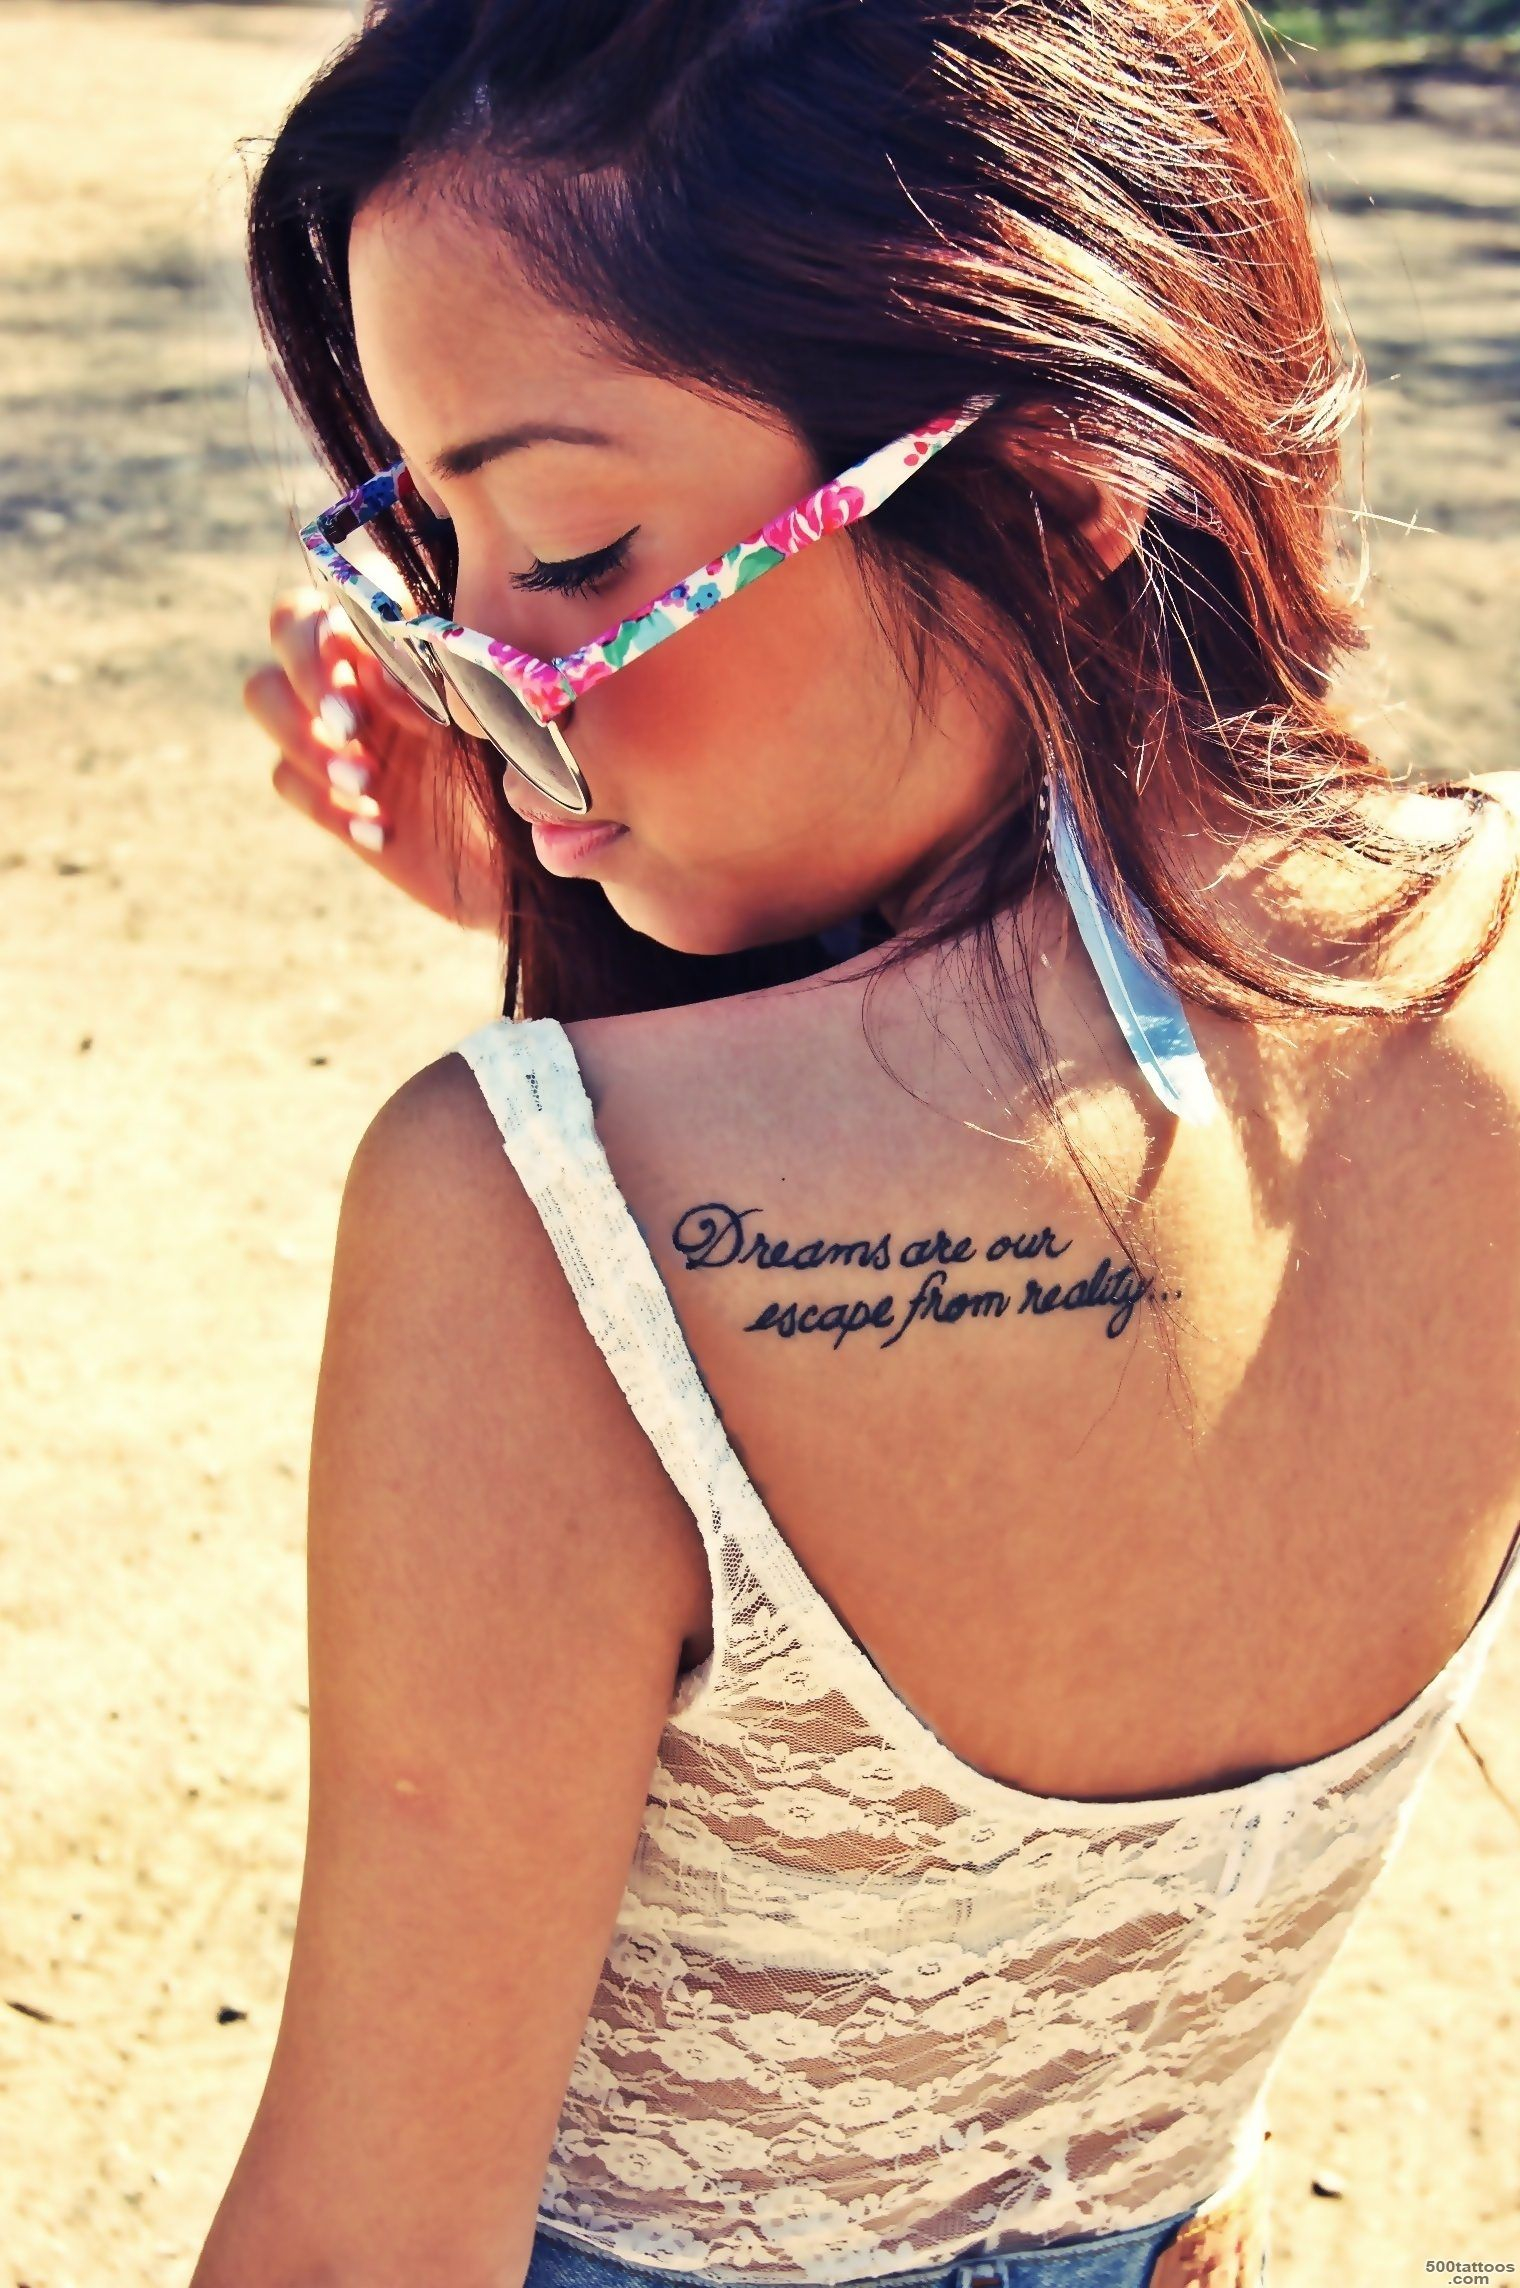 On Shoulder Blade Tattoo Photo Num 20409 throughout size 1520 X 2288